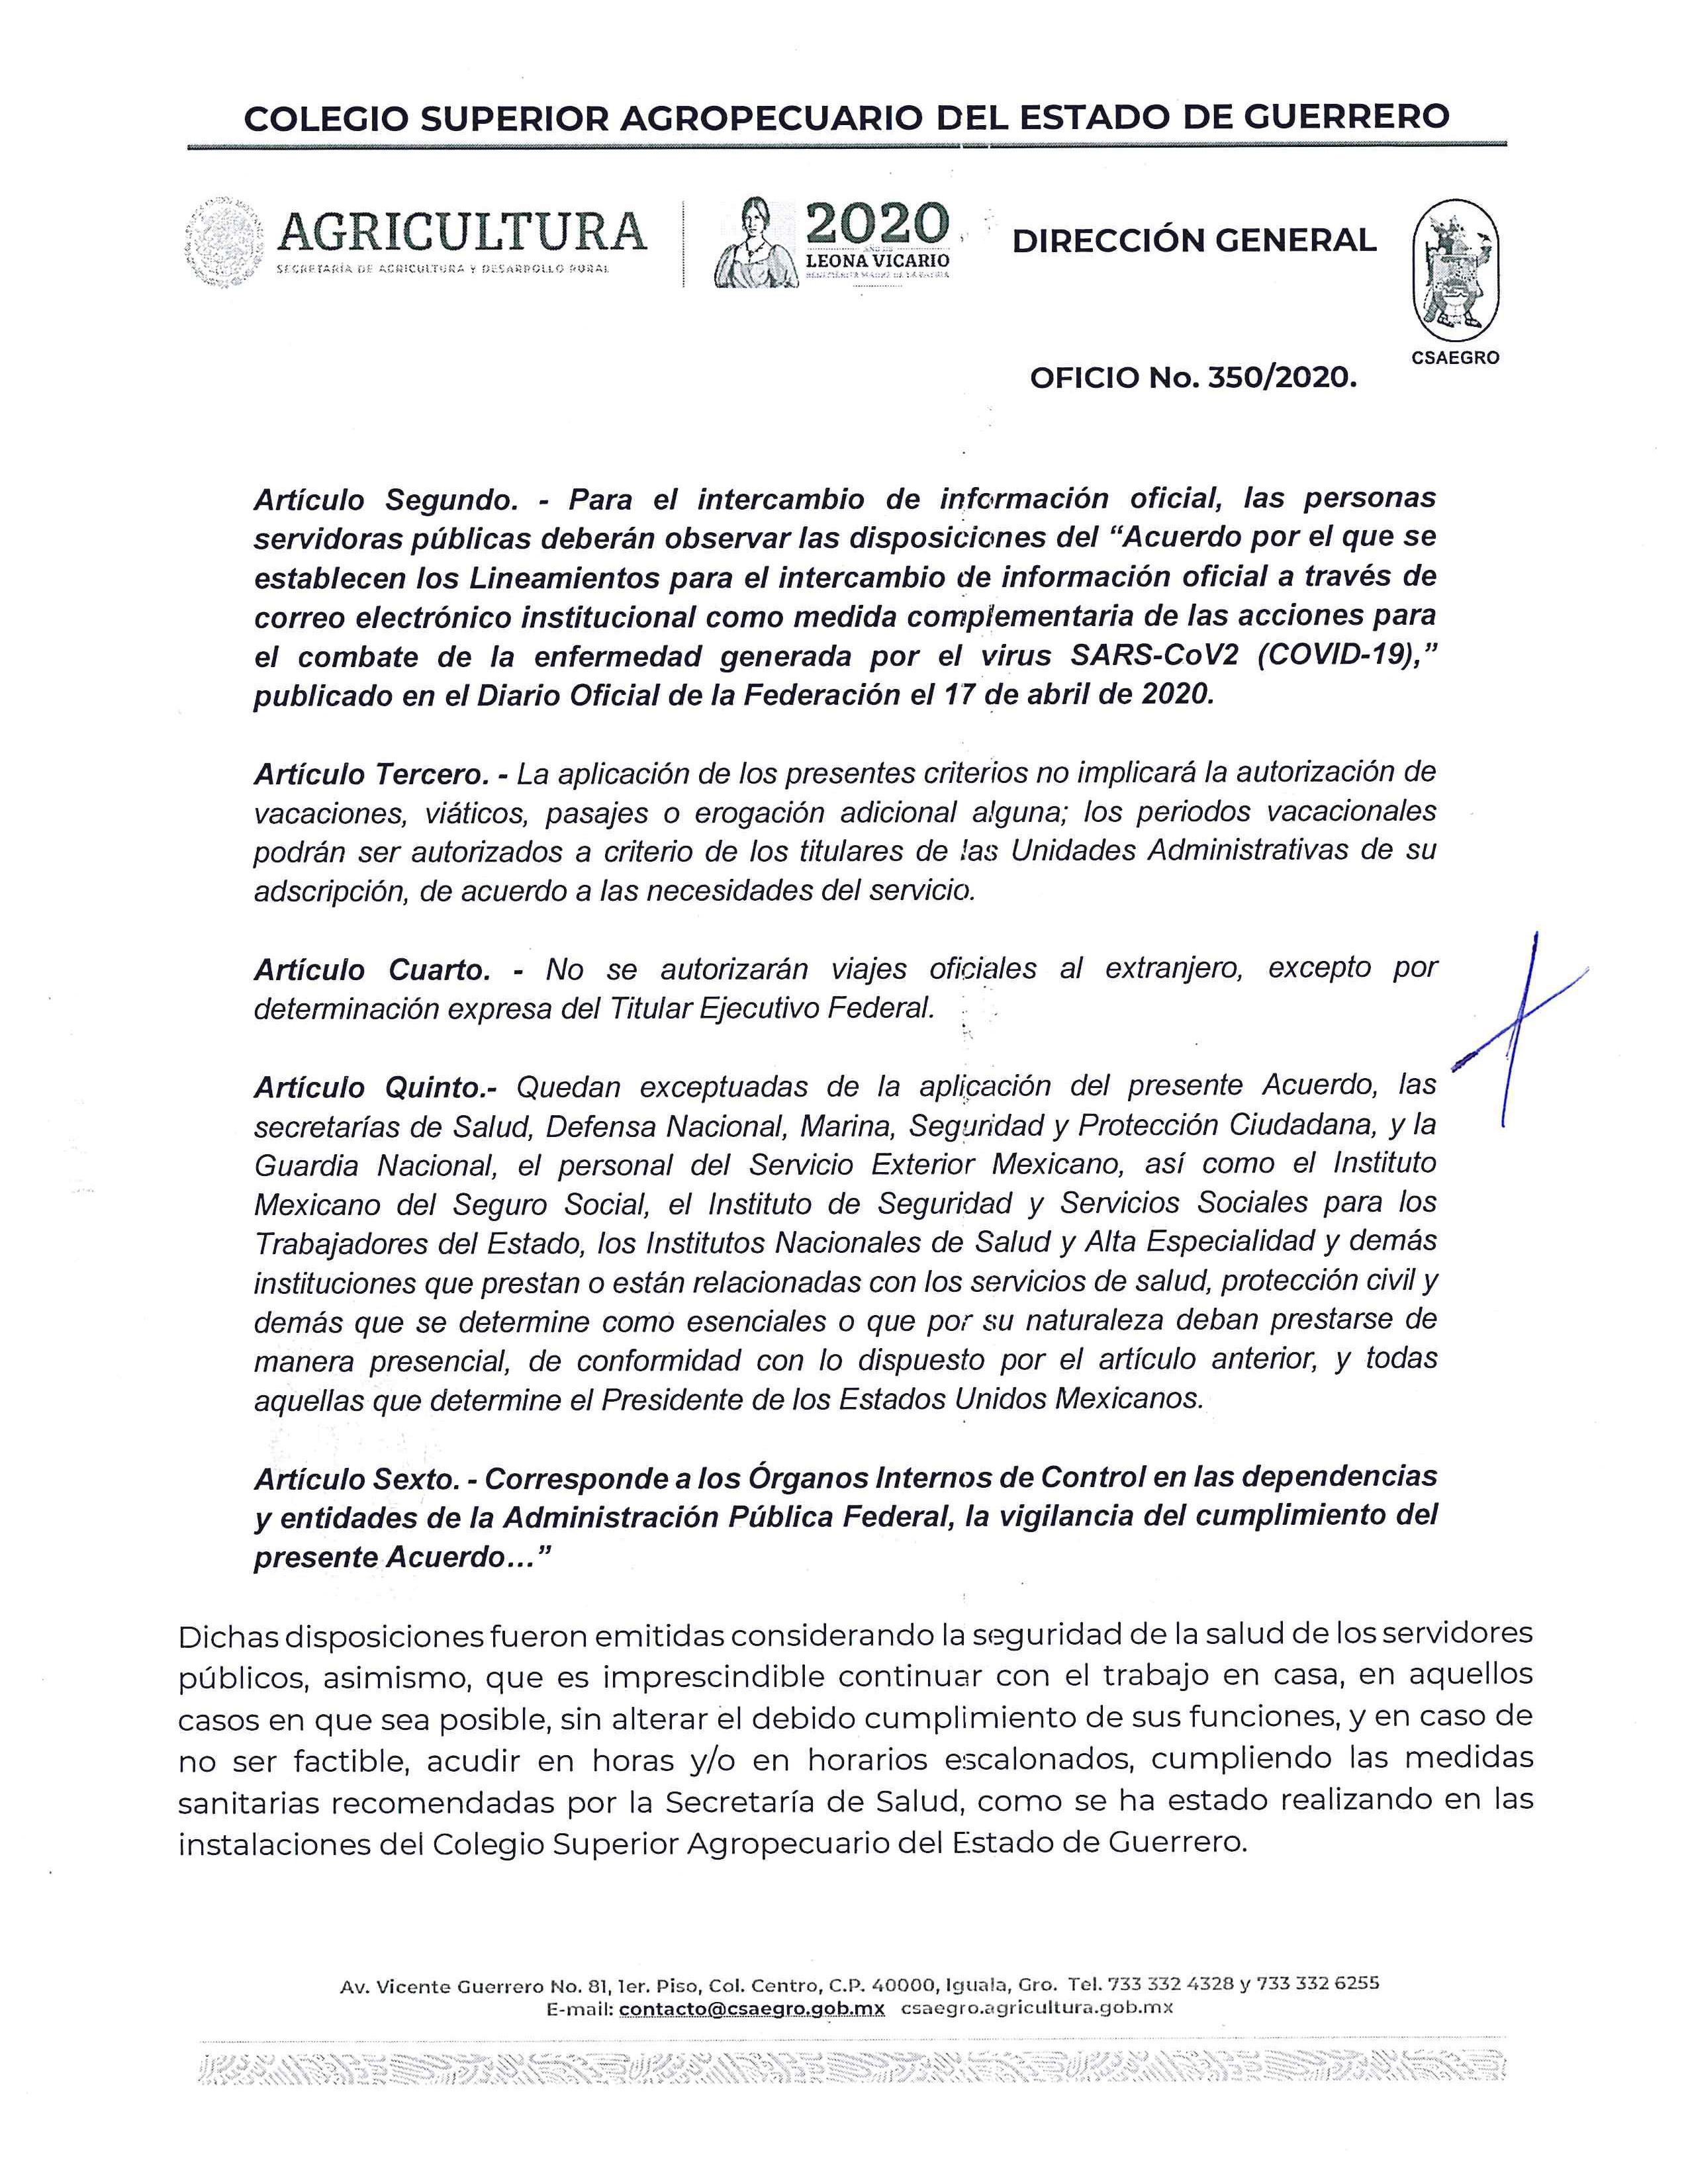 Oficio No.350.2020 Comunicado General CSAEGRO Pag. 3